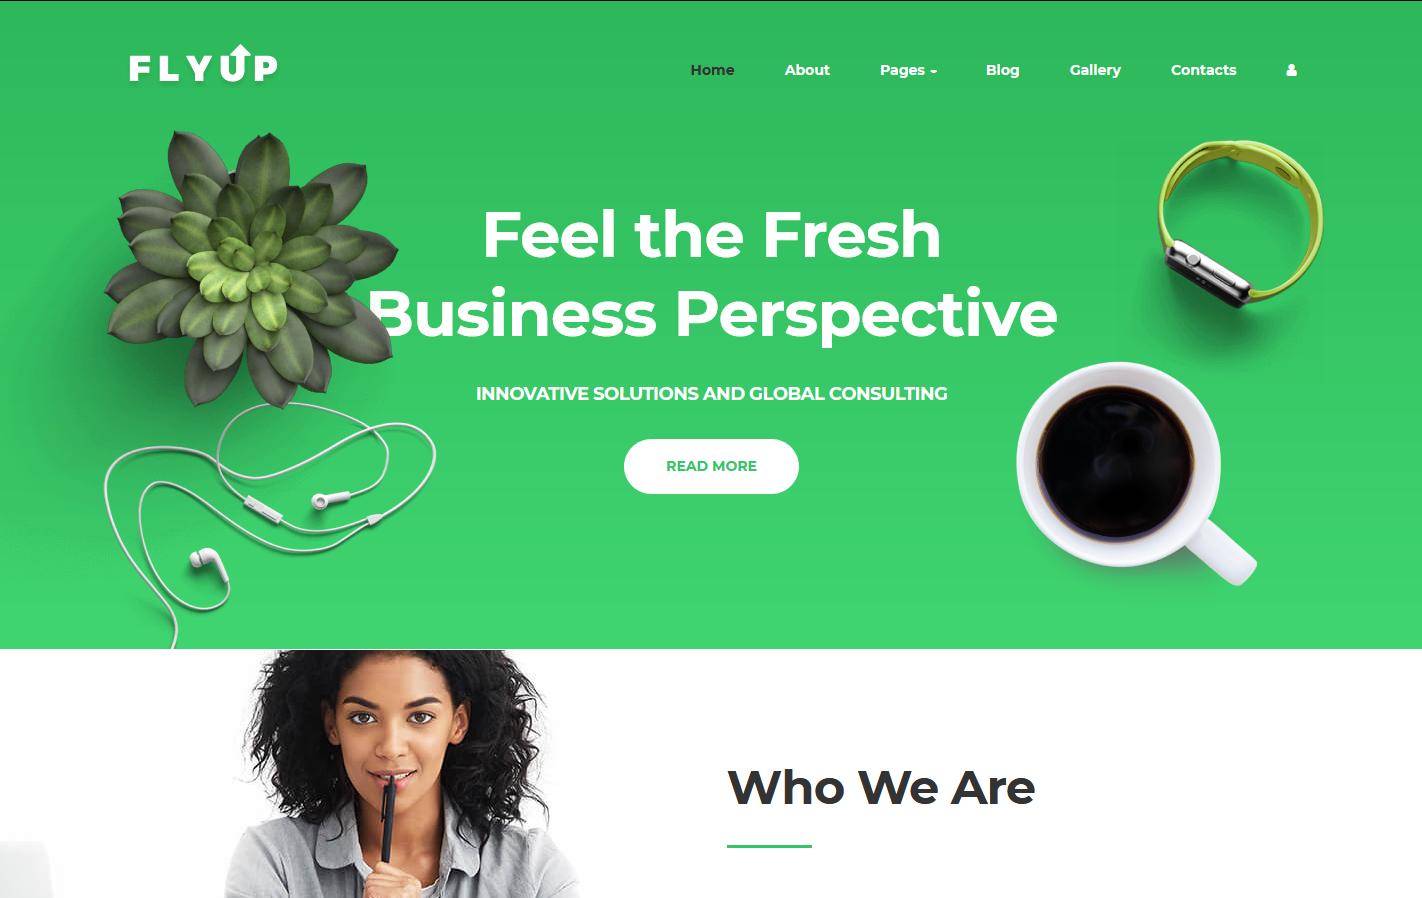 https://www.templatemonster.com/joomla-templates/flyup-fresh-startup-business-joomla-template-69711.html?aff=rahulxarma